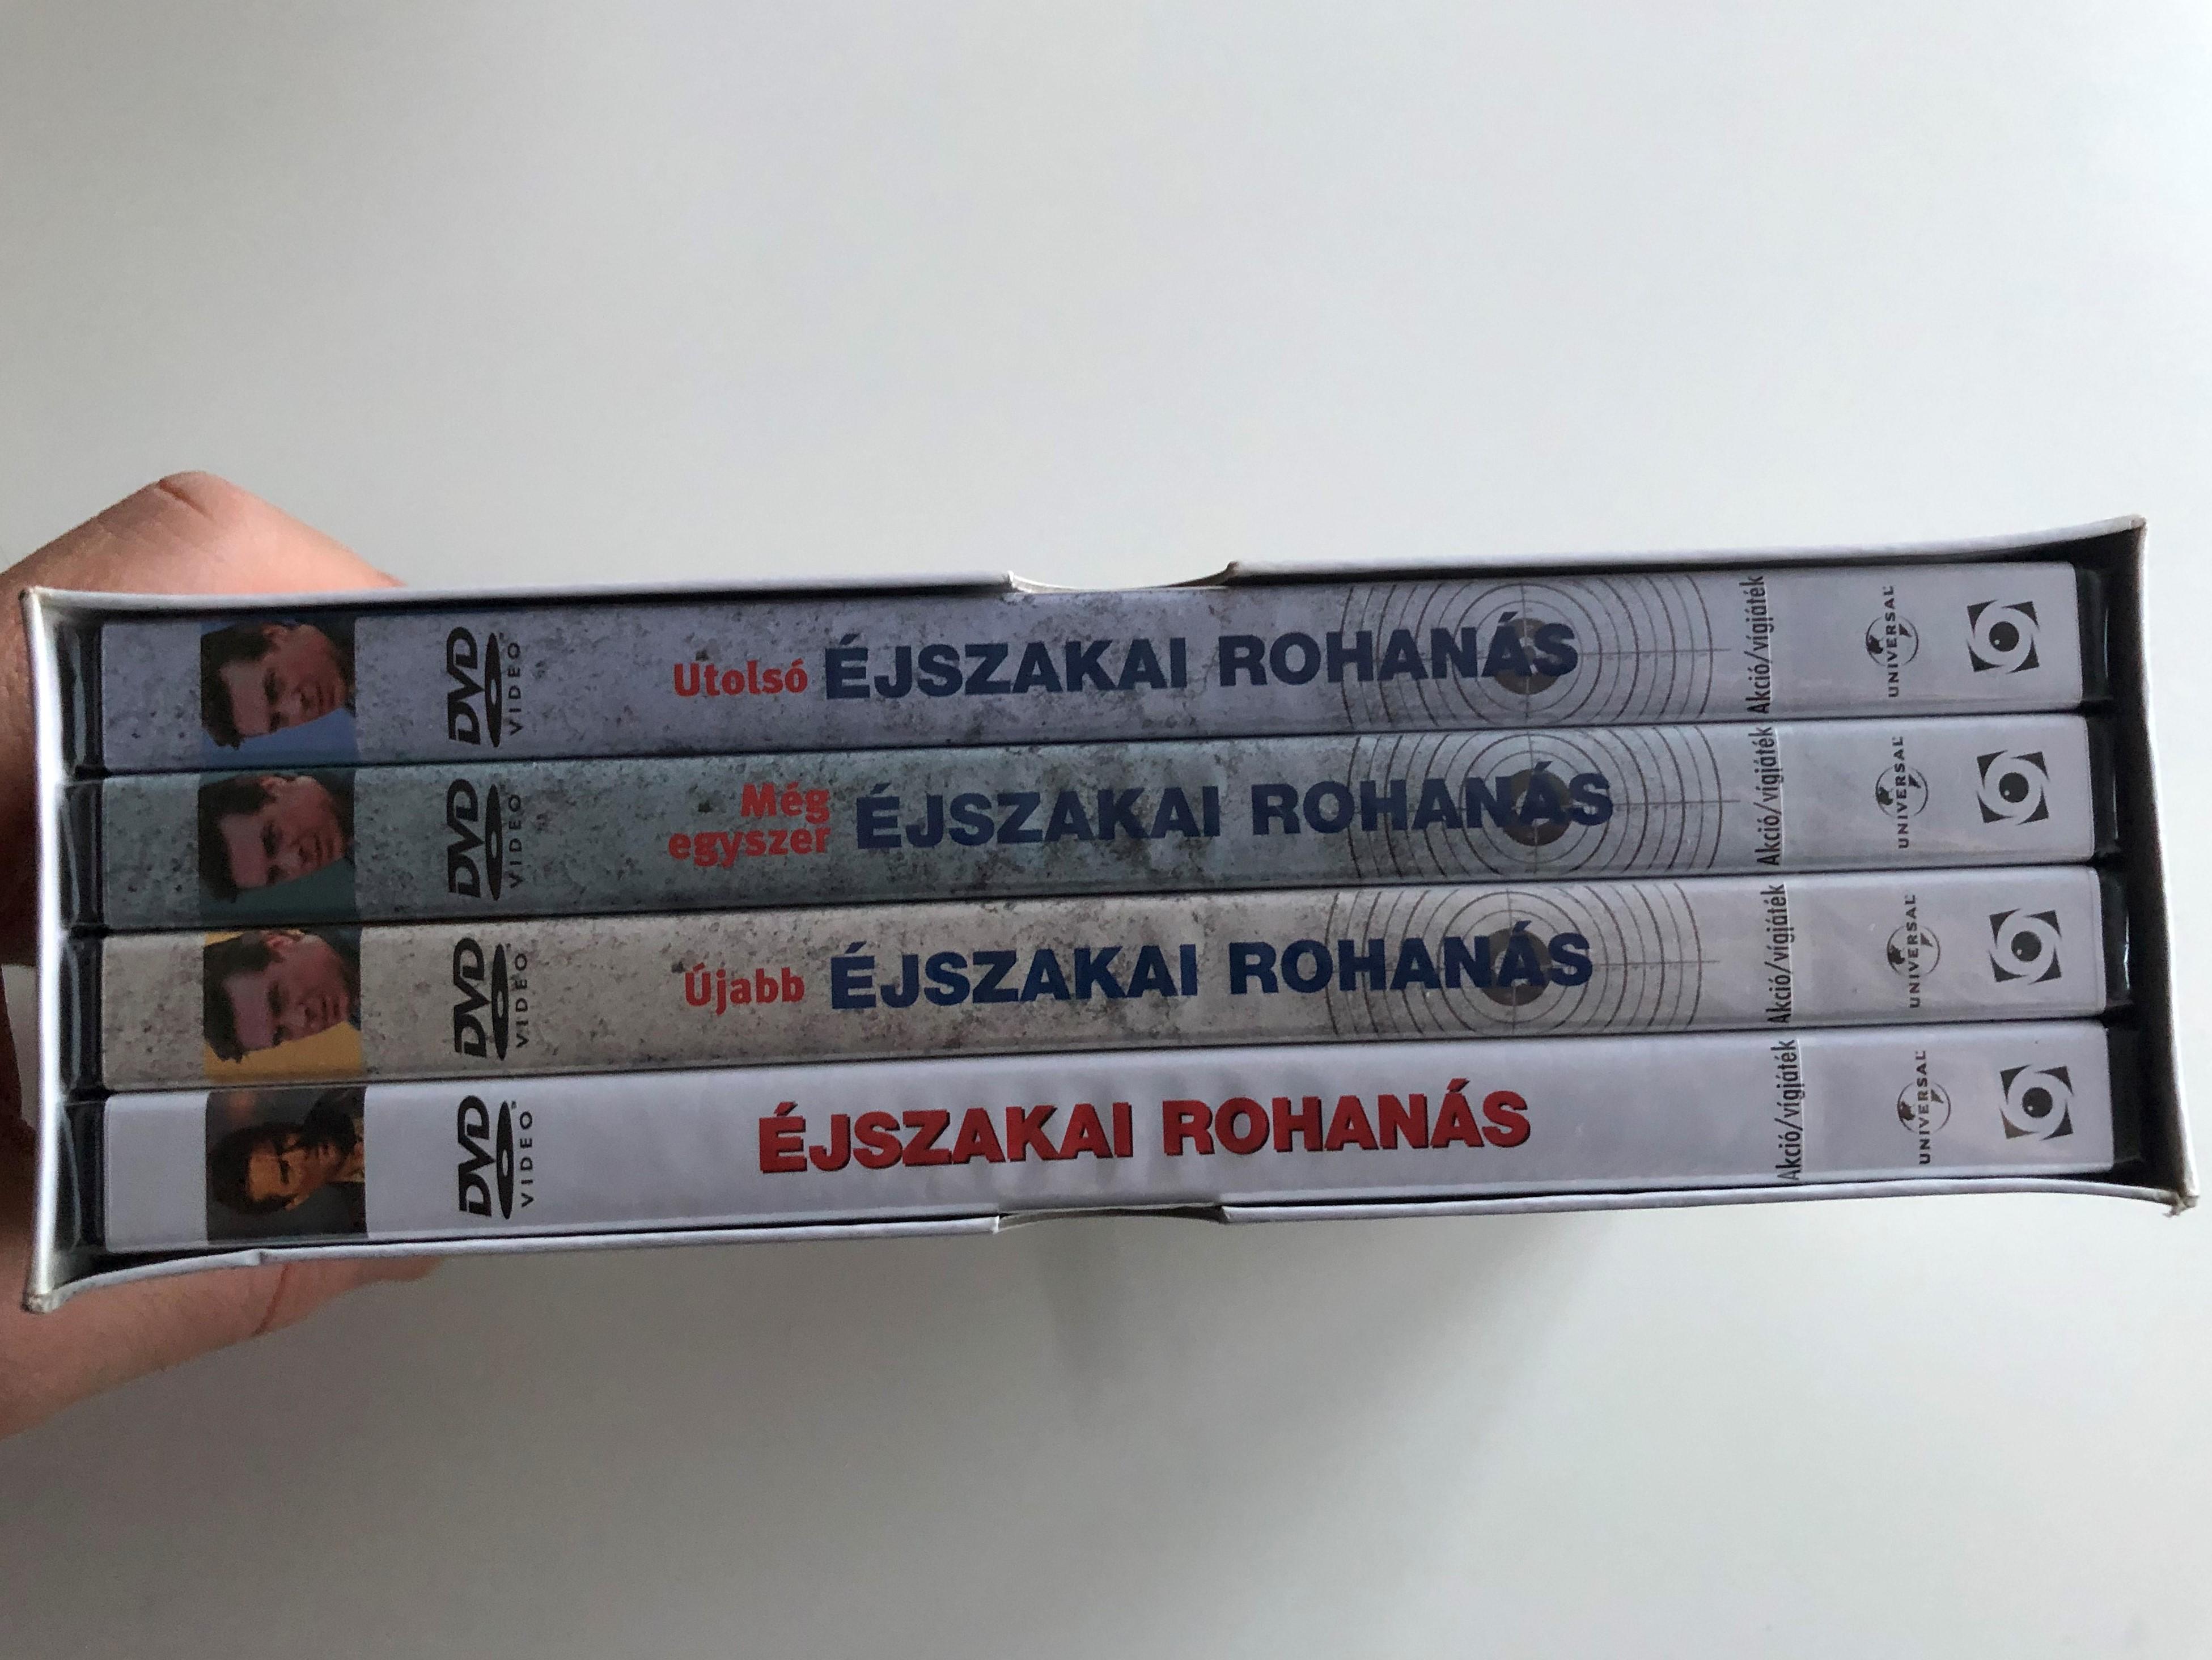 the-midnight-run-action-pack-dvd-set-1988-jszakai-rohan-s-a-gy-jtem-ny-4-dvd-4.jpg